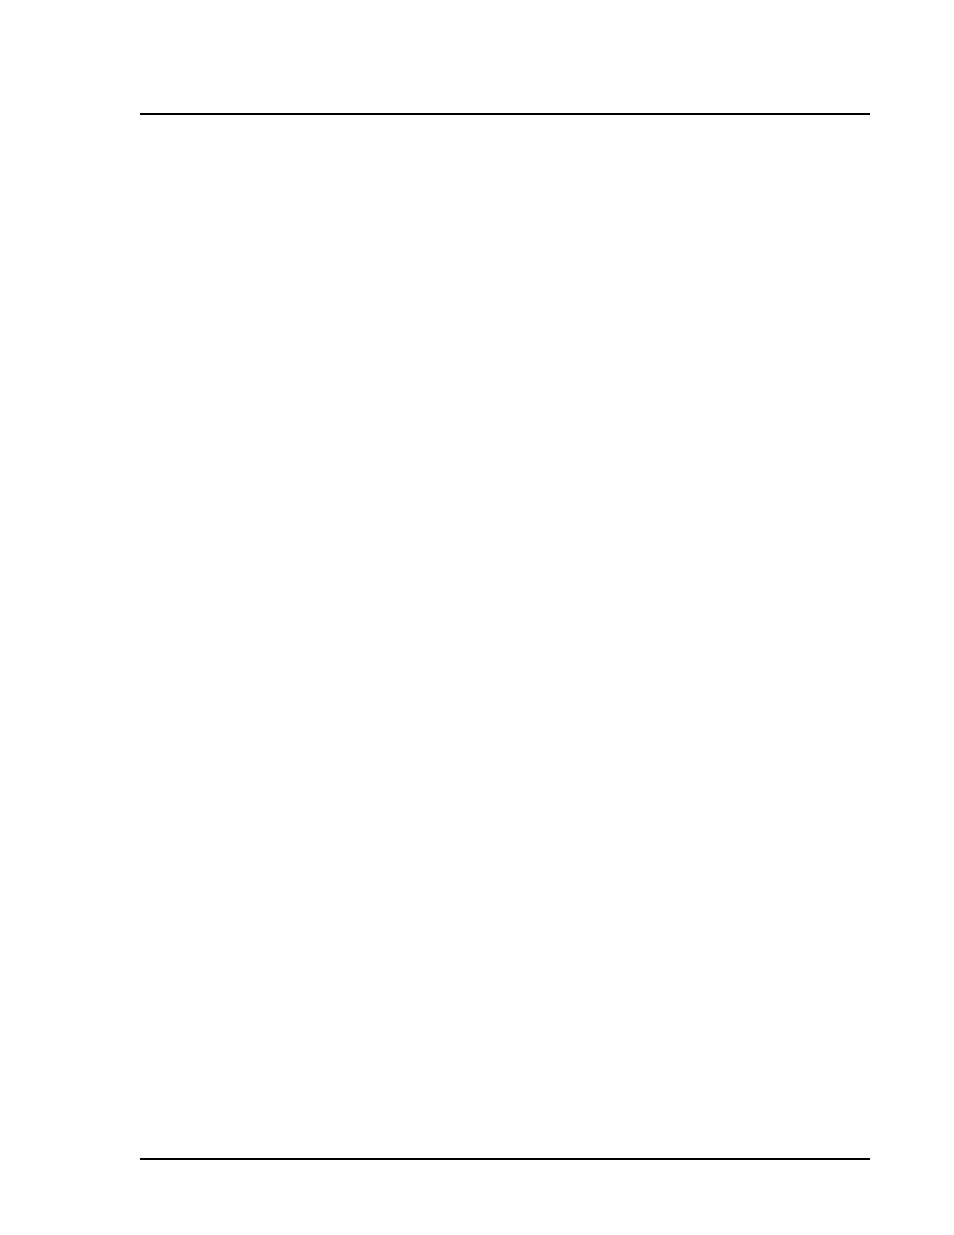 Luminex 200 user manual.